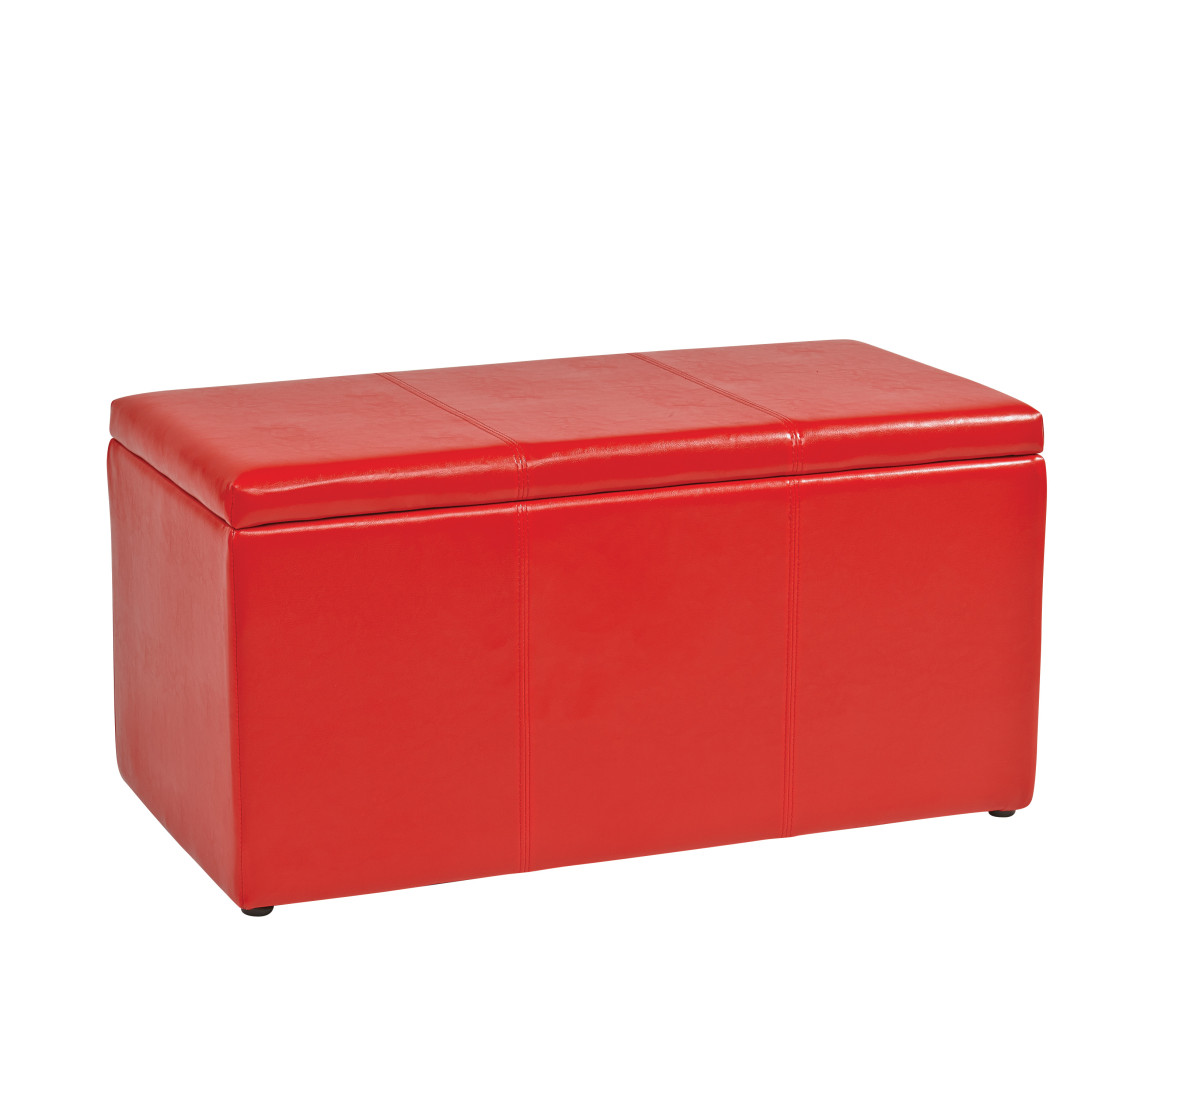 Astounding 3 Piece Red Vinyl Ottoman Set Creativecarmelina Interior Chair Design Creativecarmelinacom